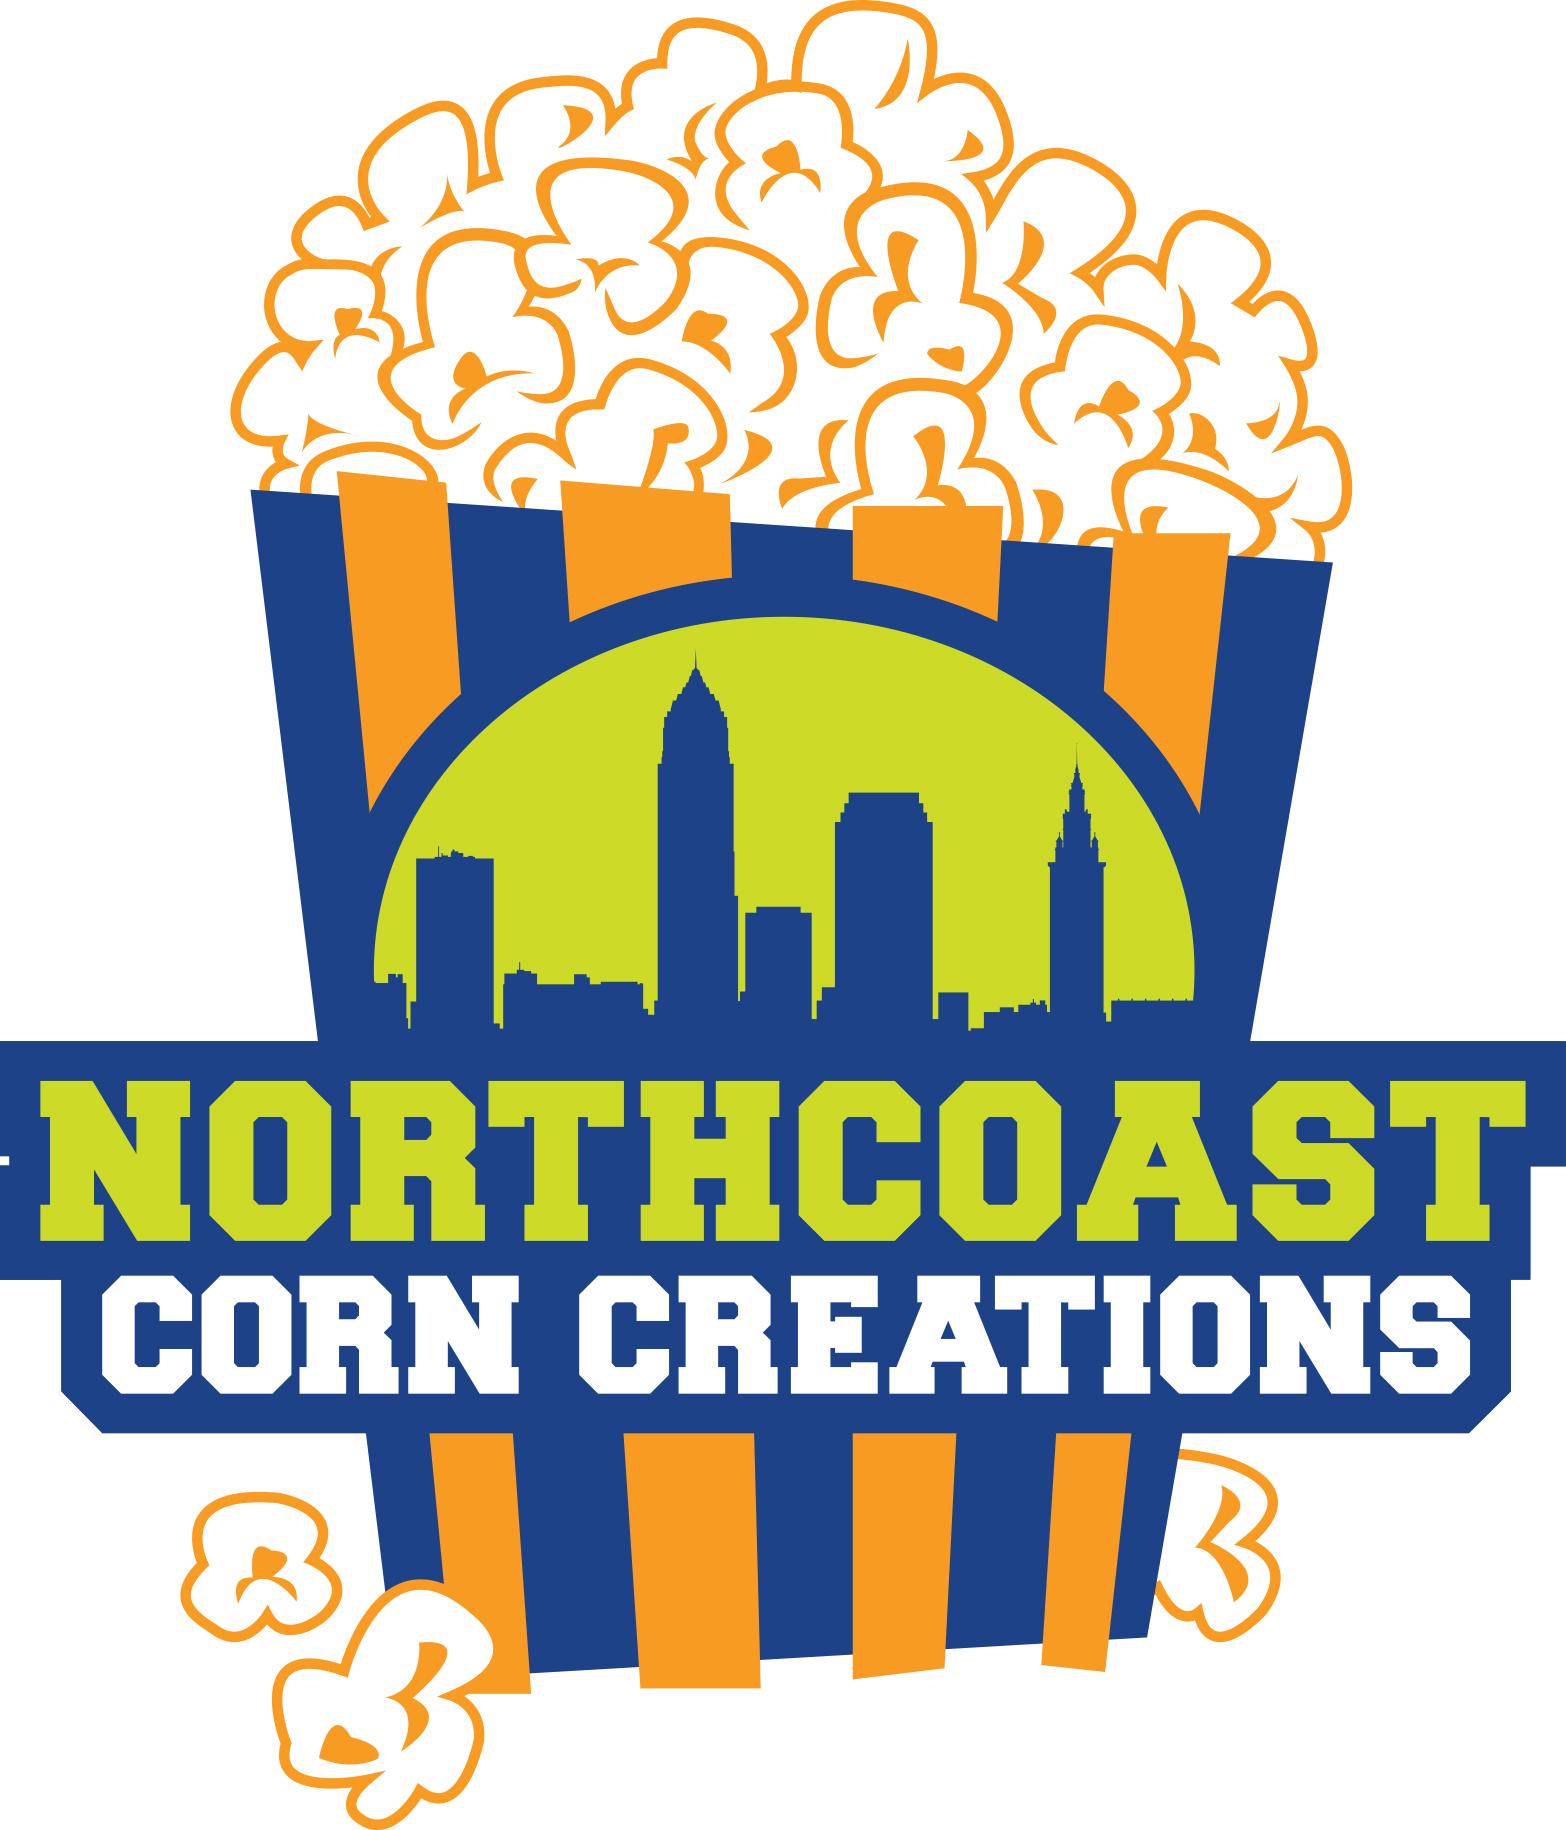 NorthCoast Corn Creations.